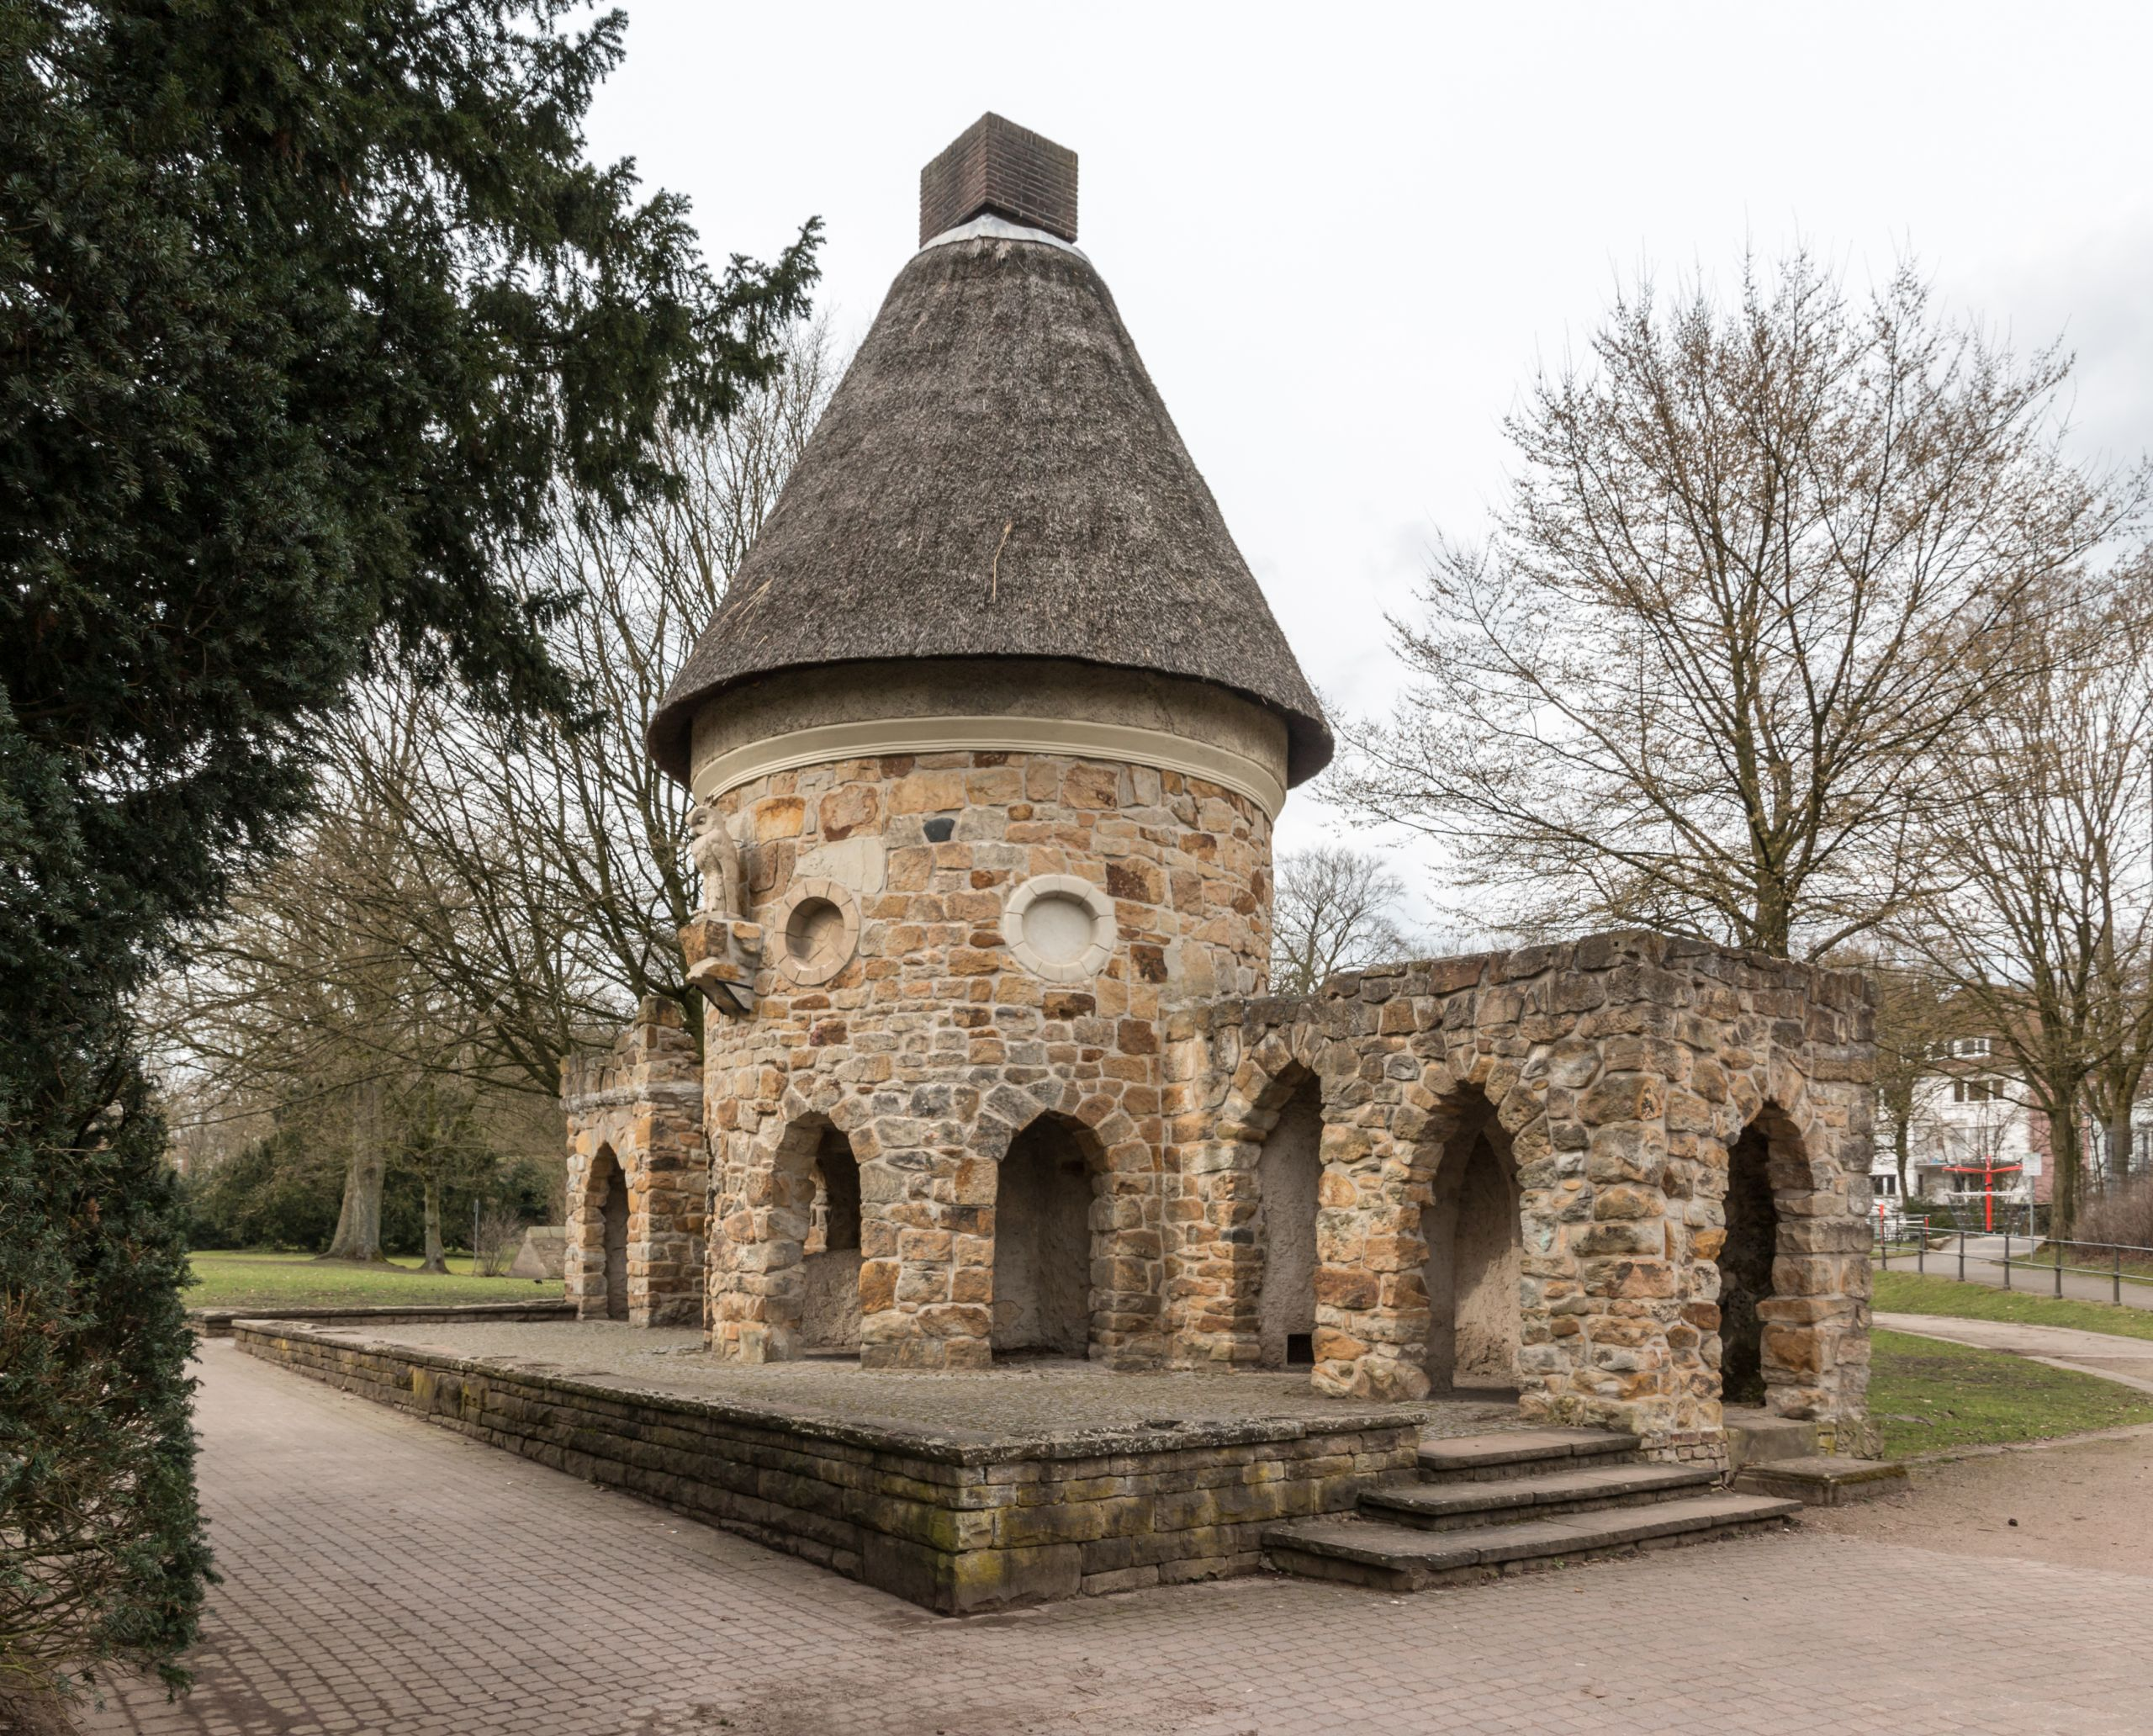 Münster Alter Zoo Eulenhaus 2016 1541